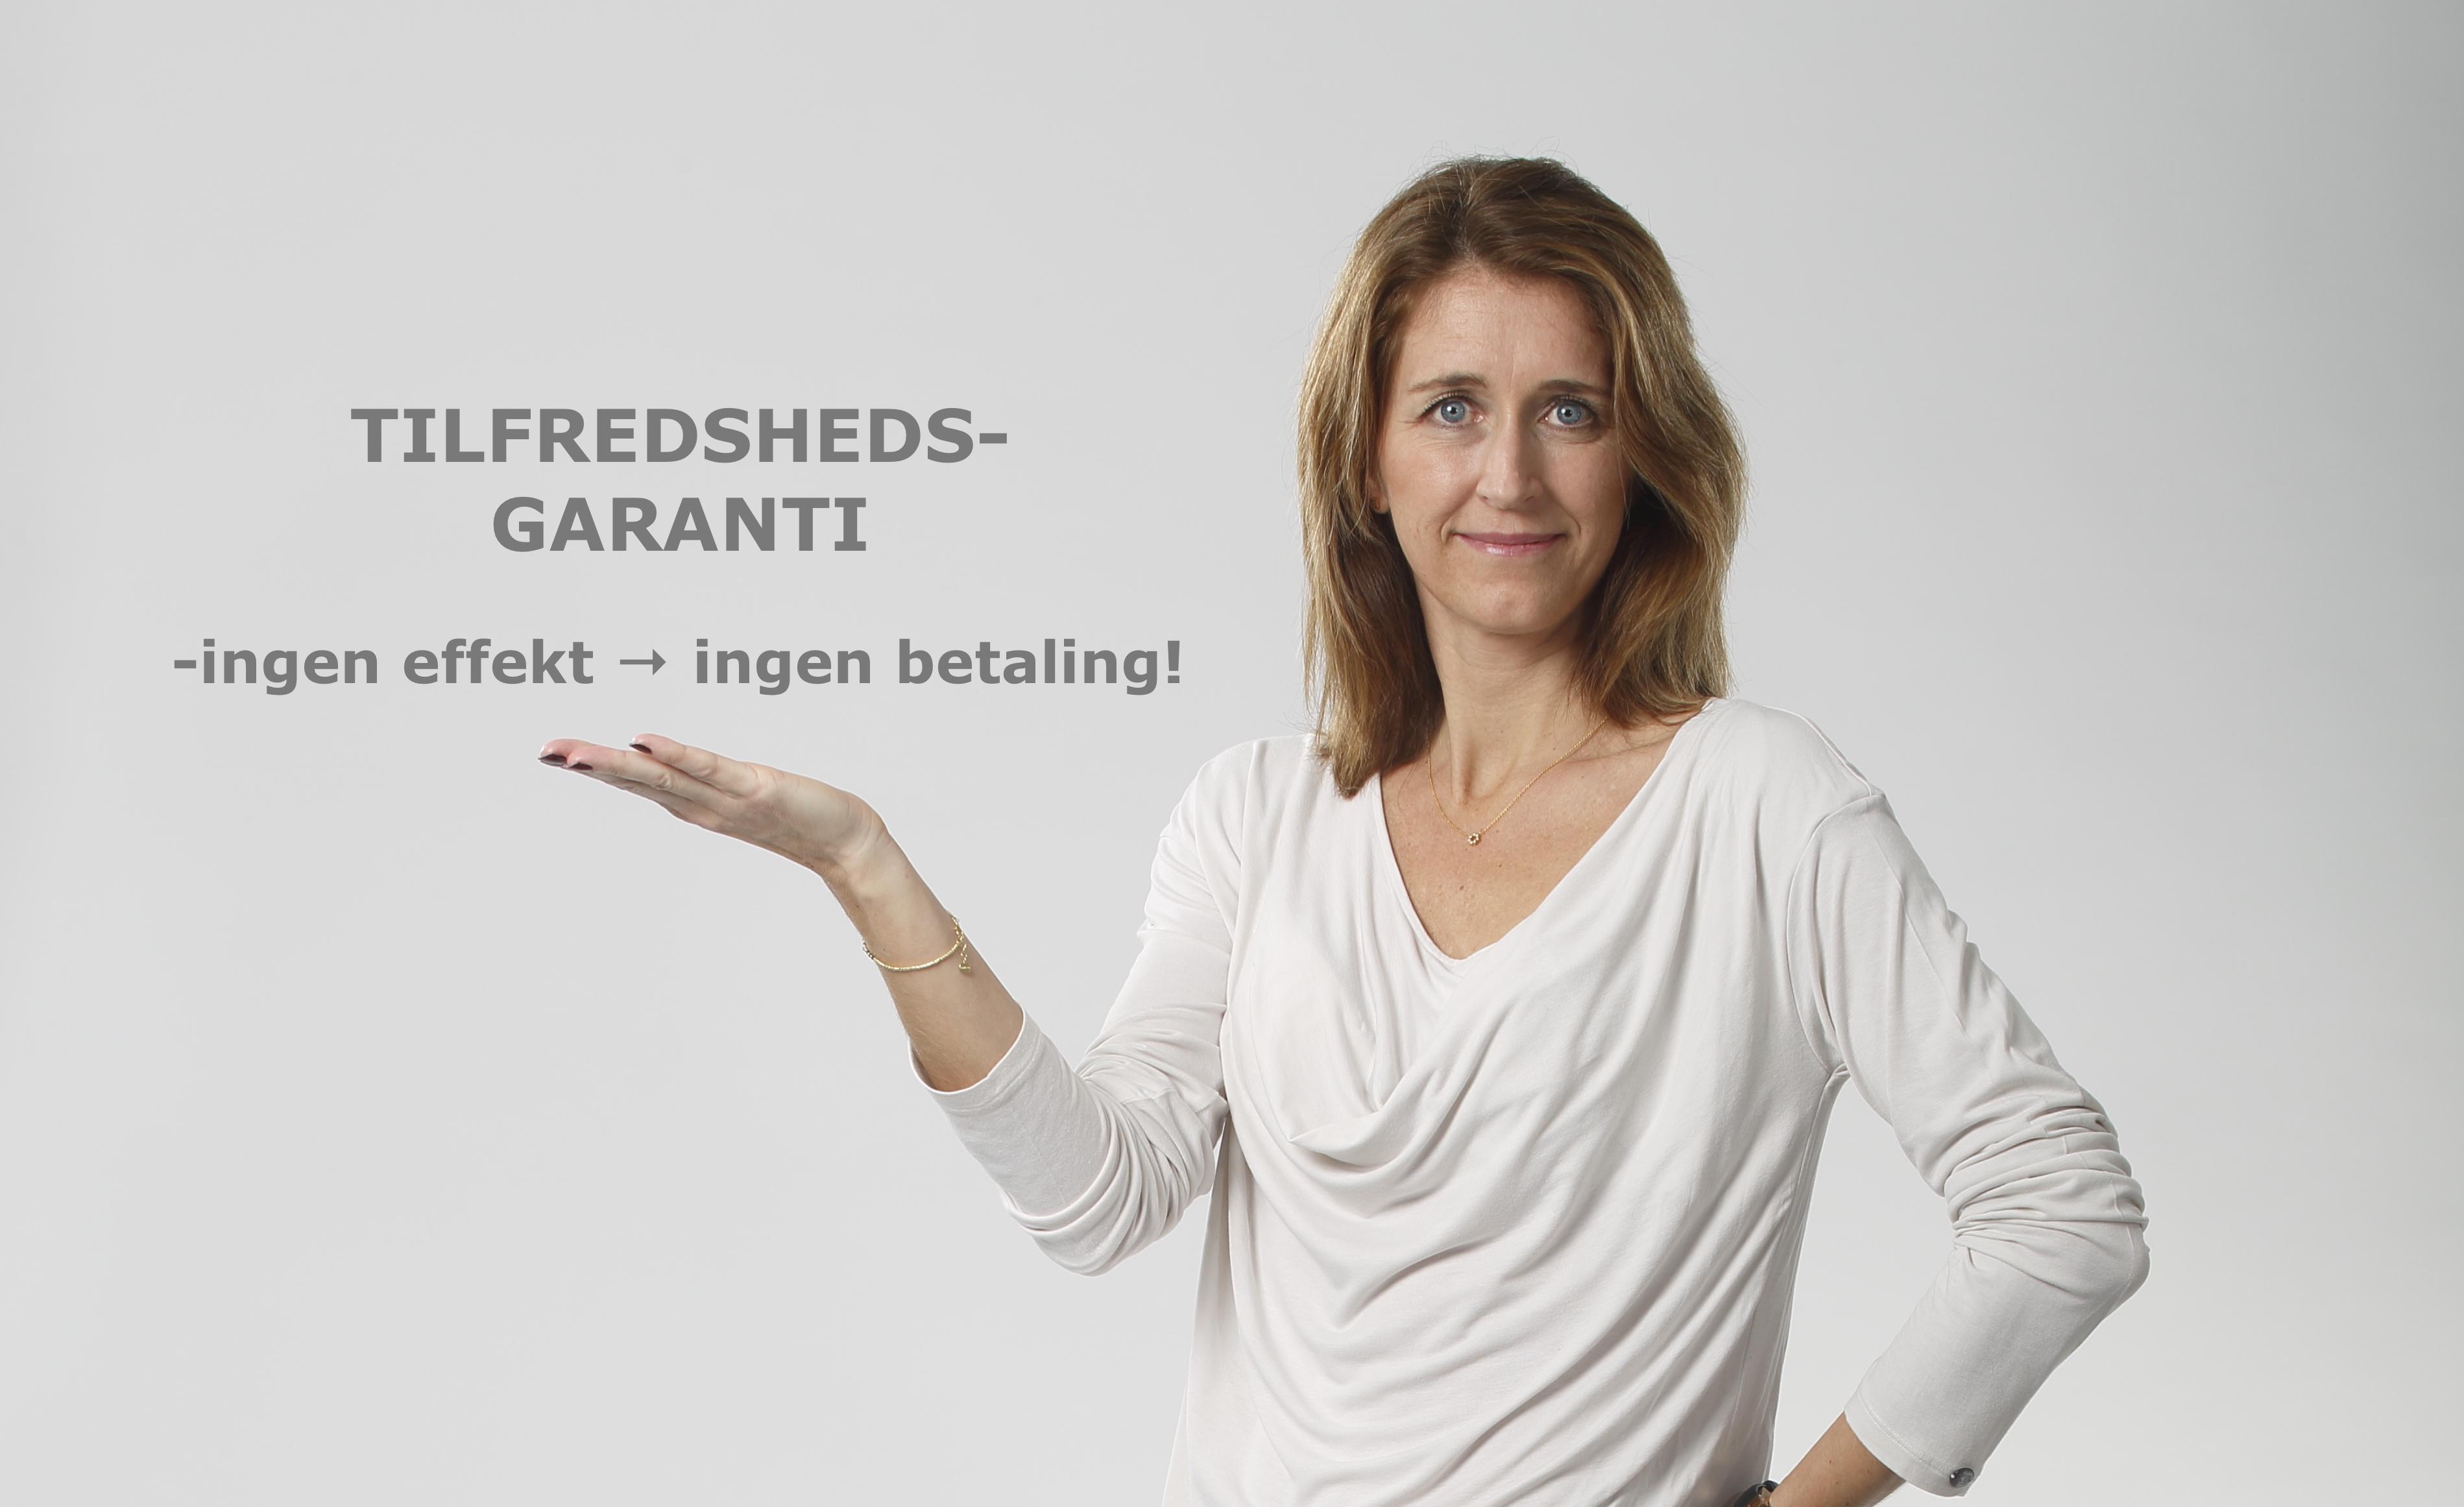 Tilfredshedsgaranti - ingen effekt→ingen betaling